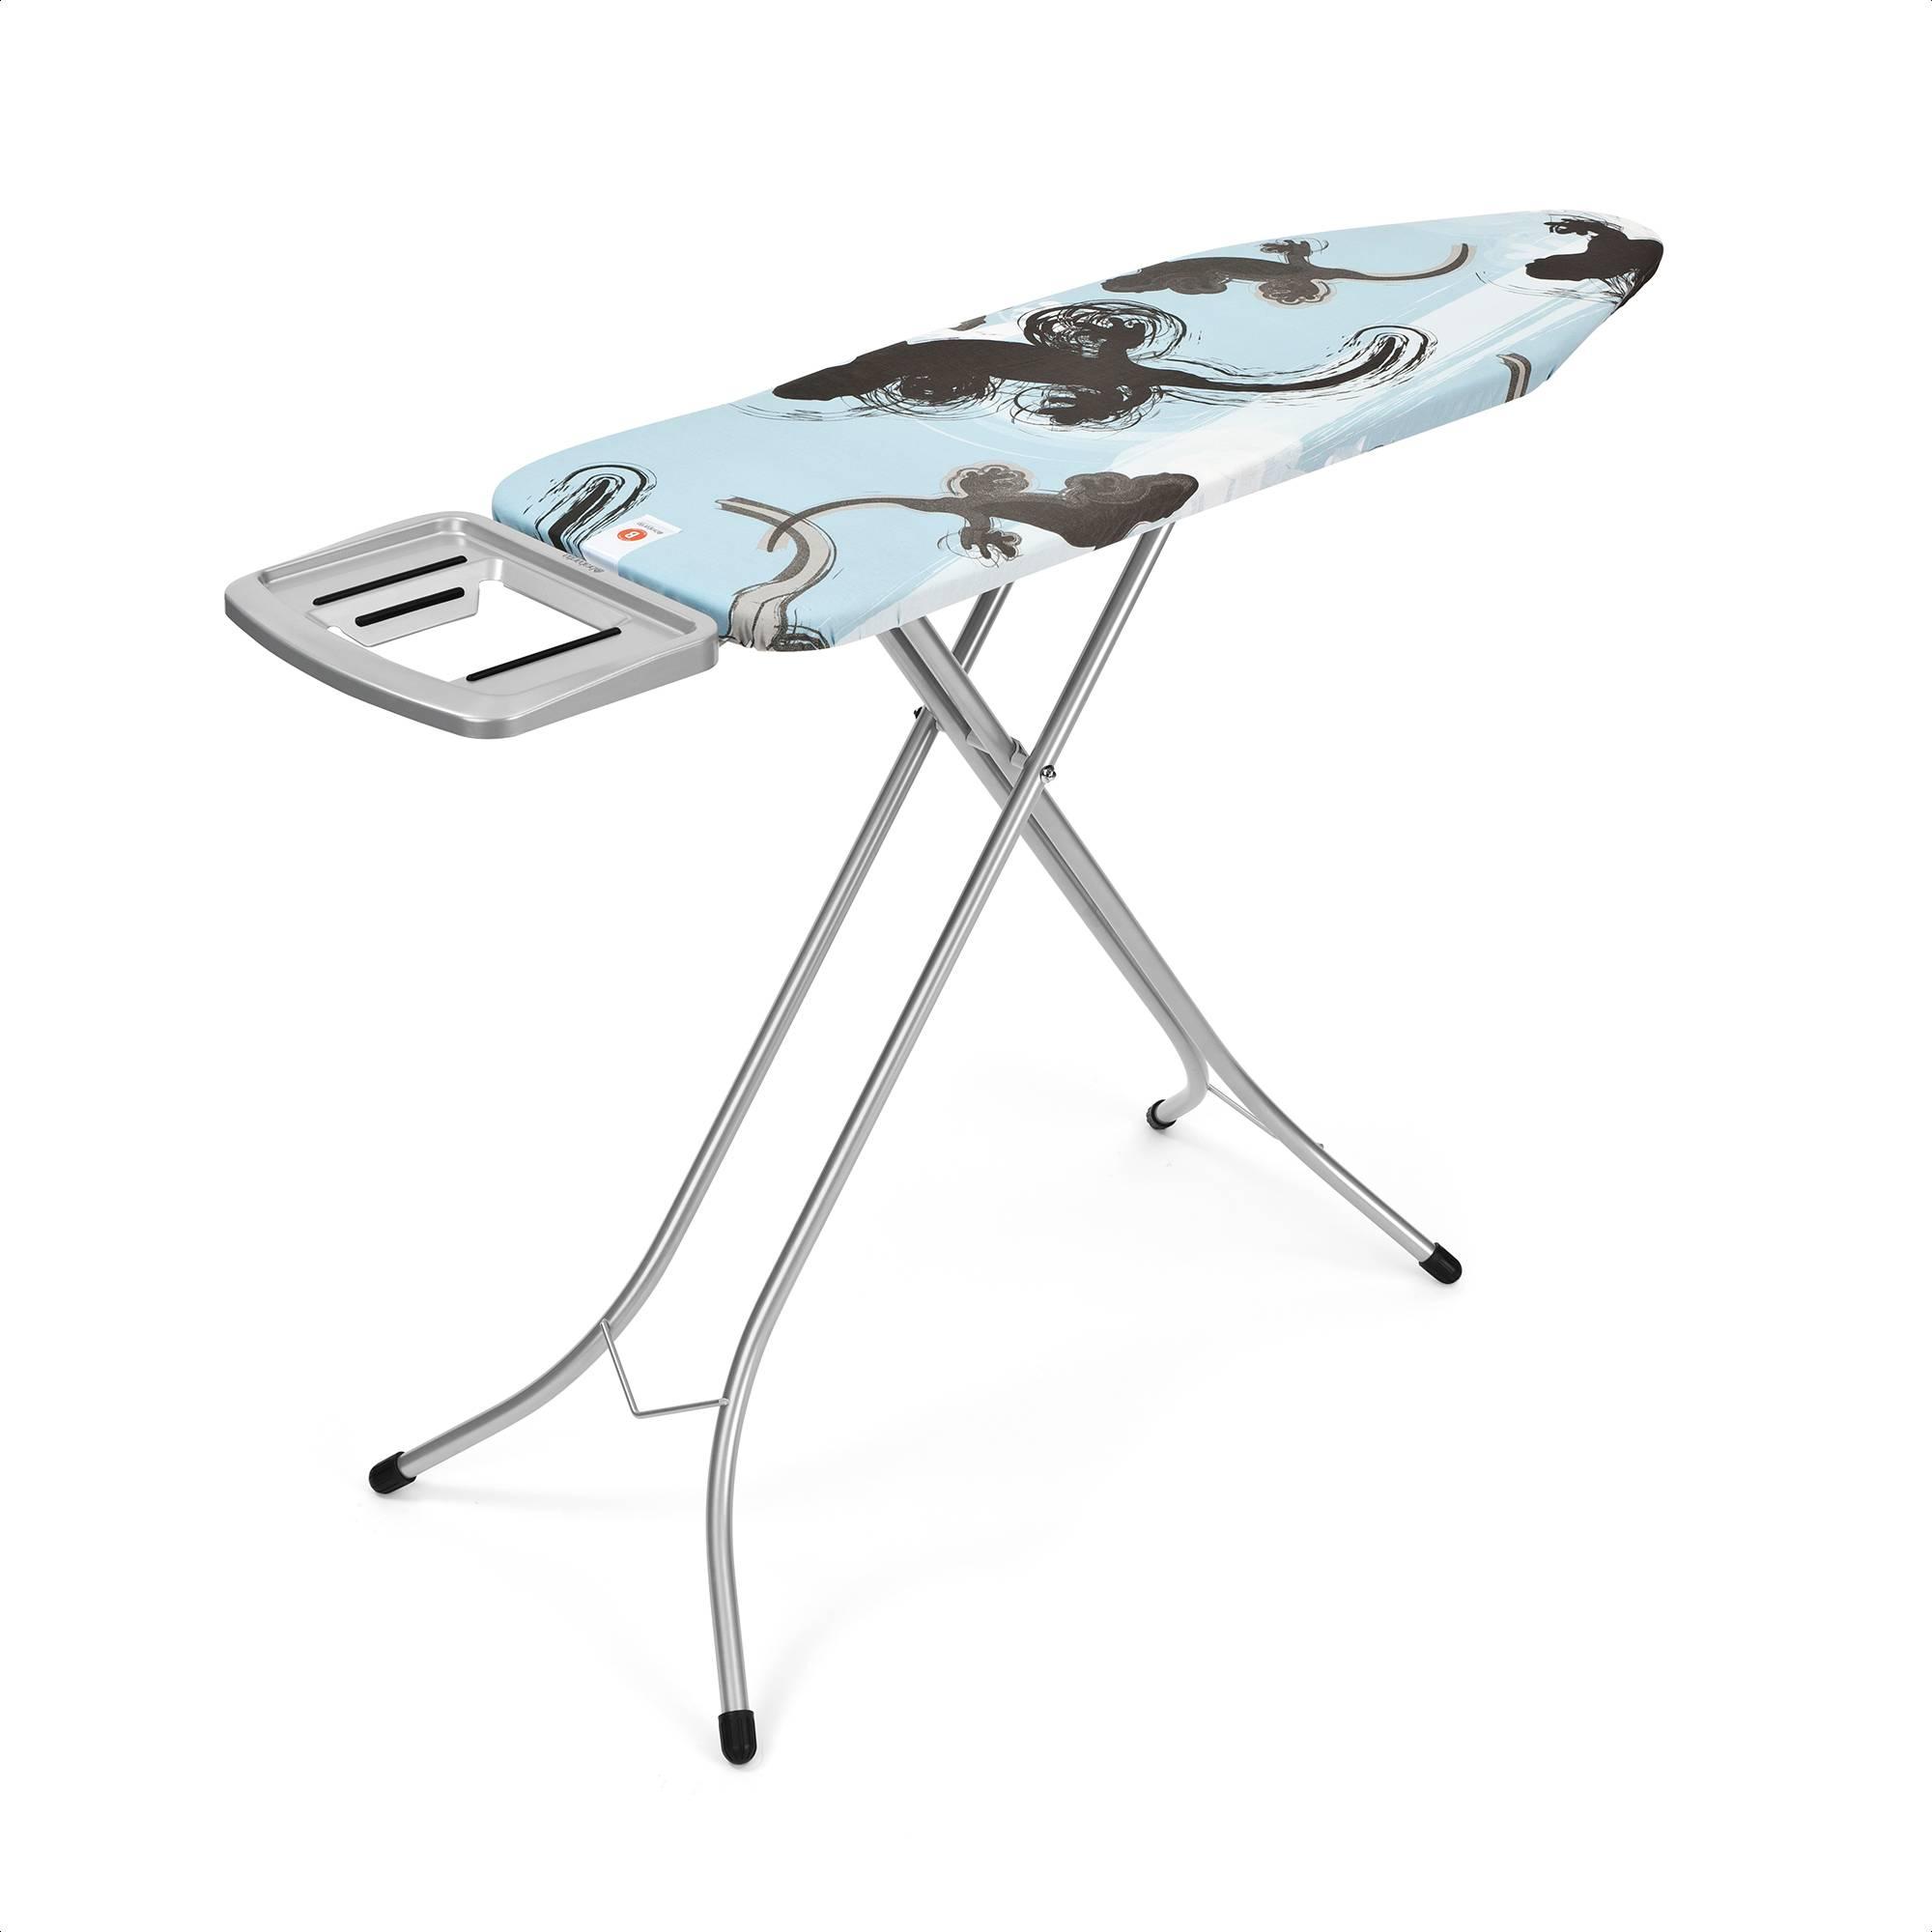 Brabantia 124 X 38cm Ironing Table